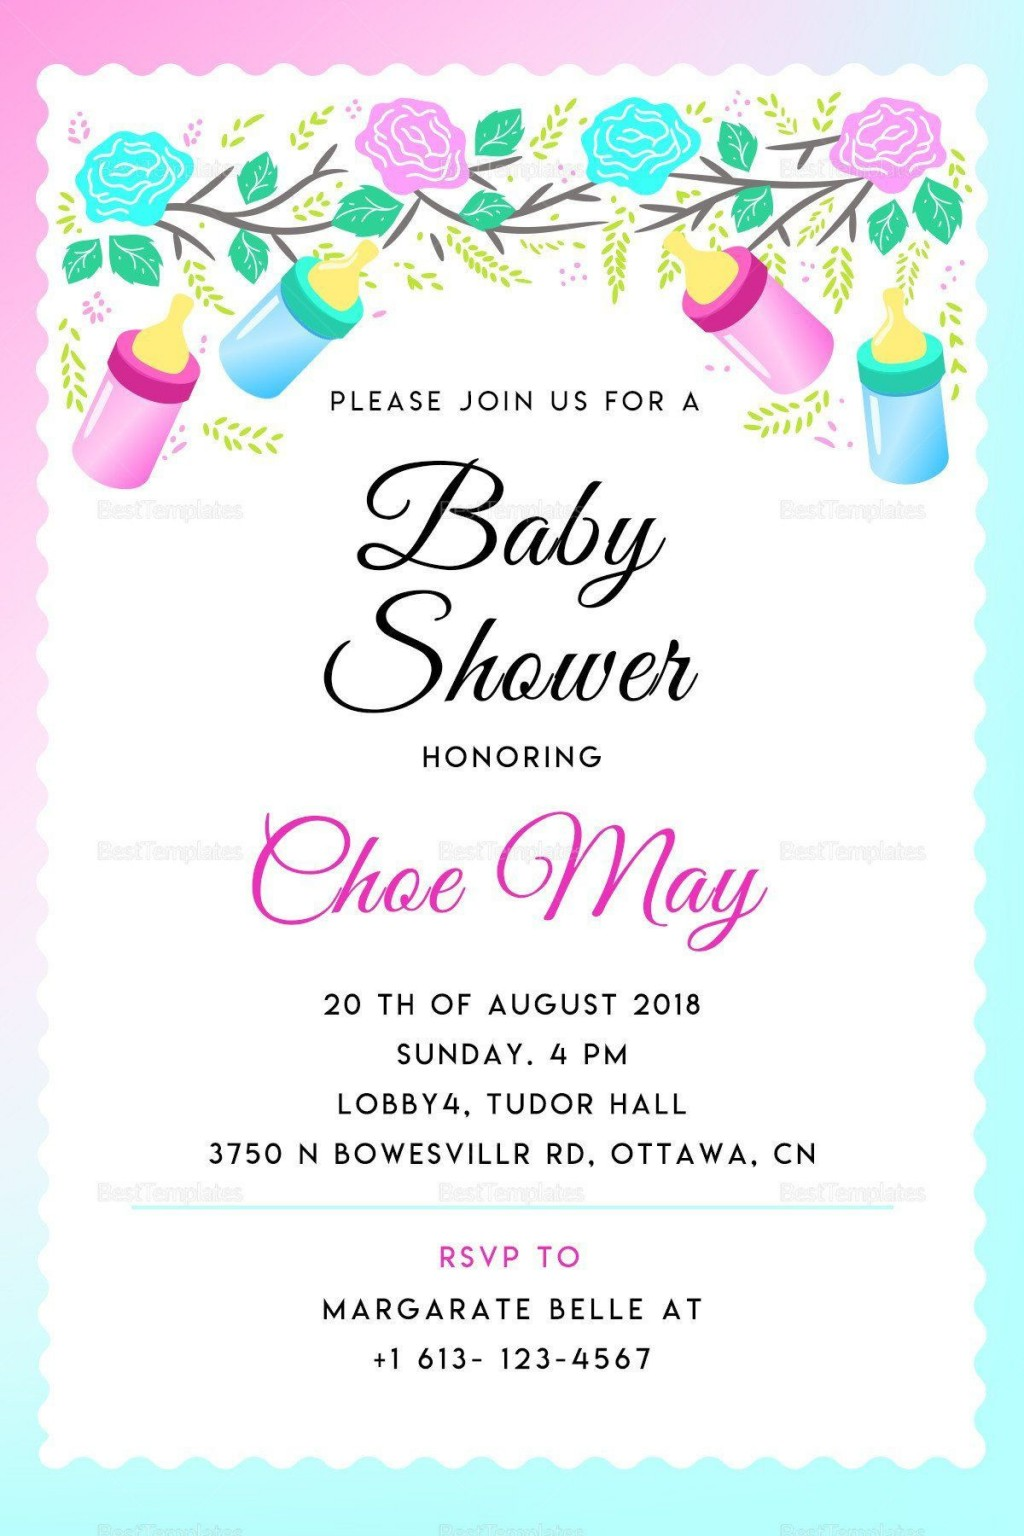 001 Surprising Free Baby Shower Invitation Template Editable High Def  Digital Microsoft WordLarge